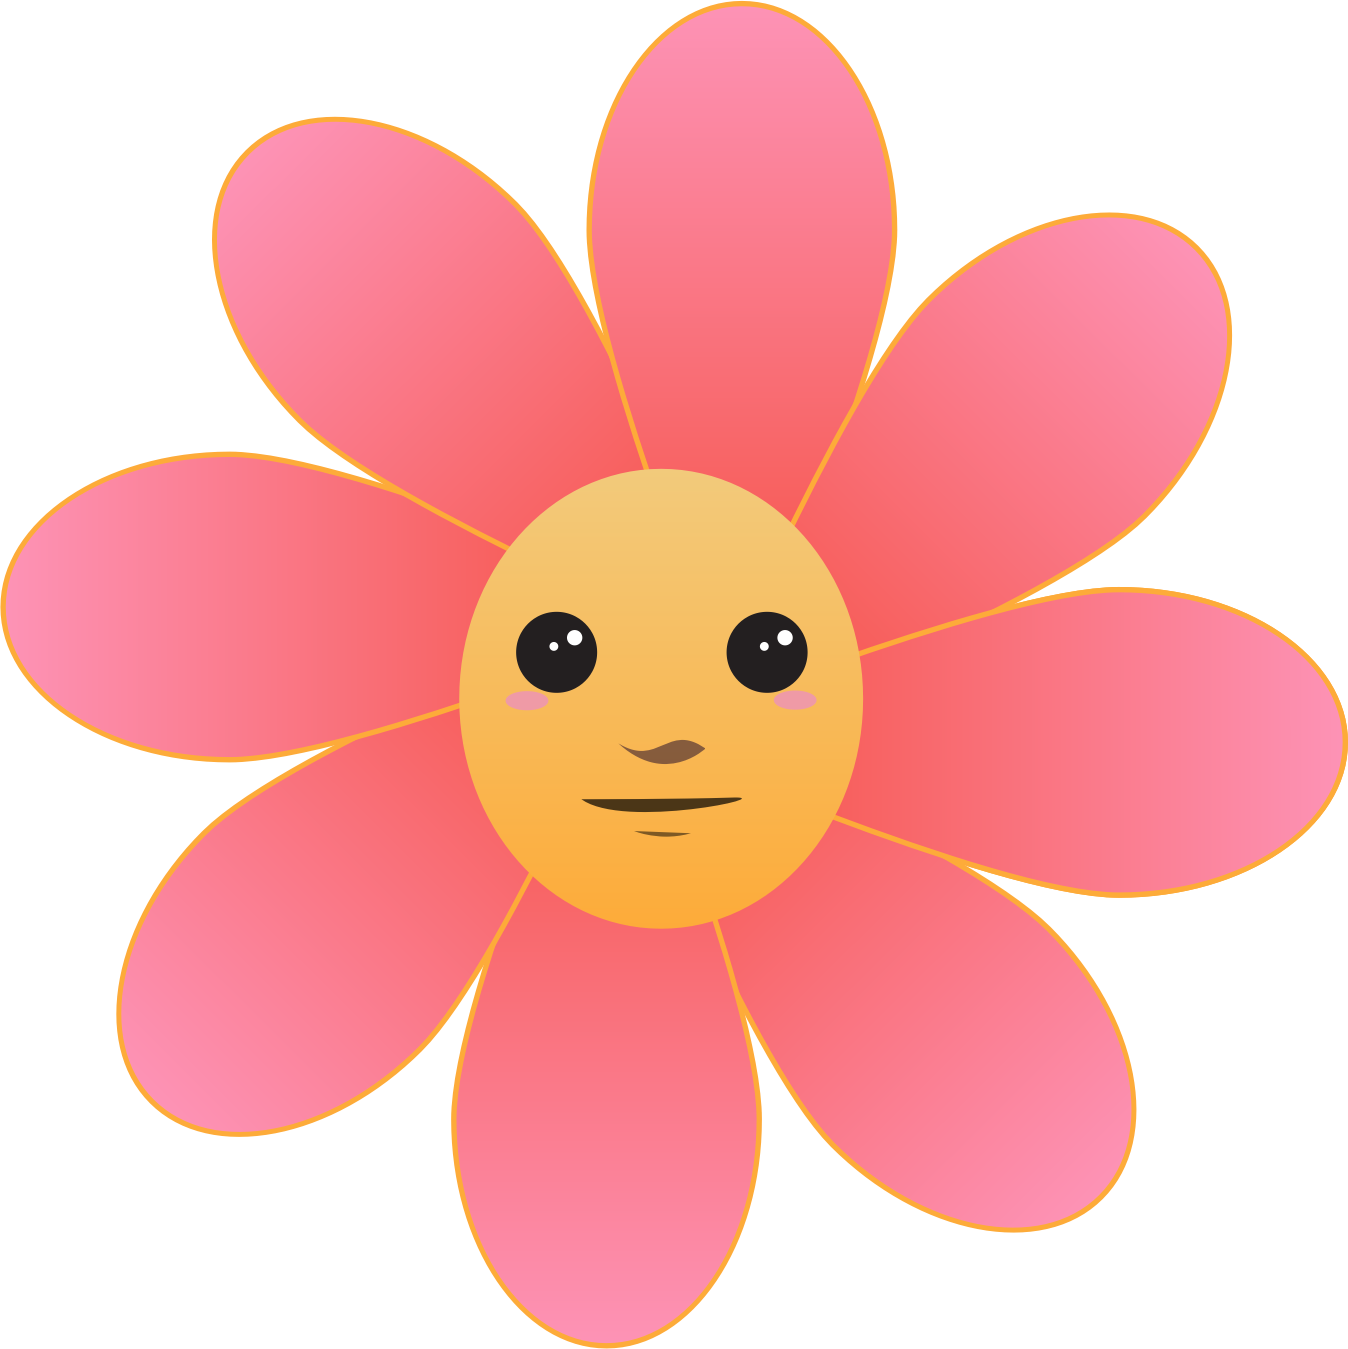 Big image png. Face clipart flower